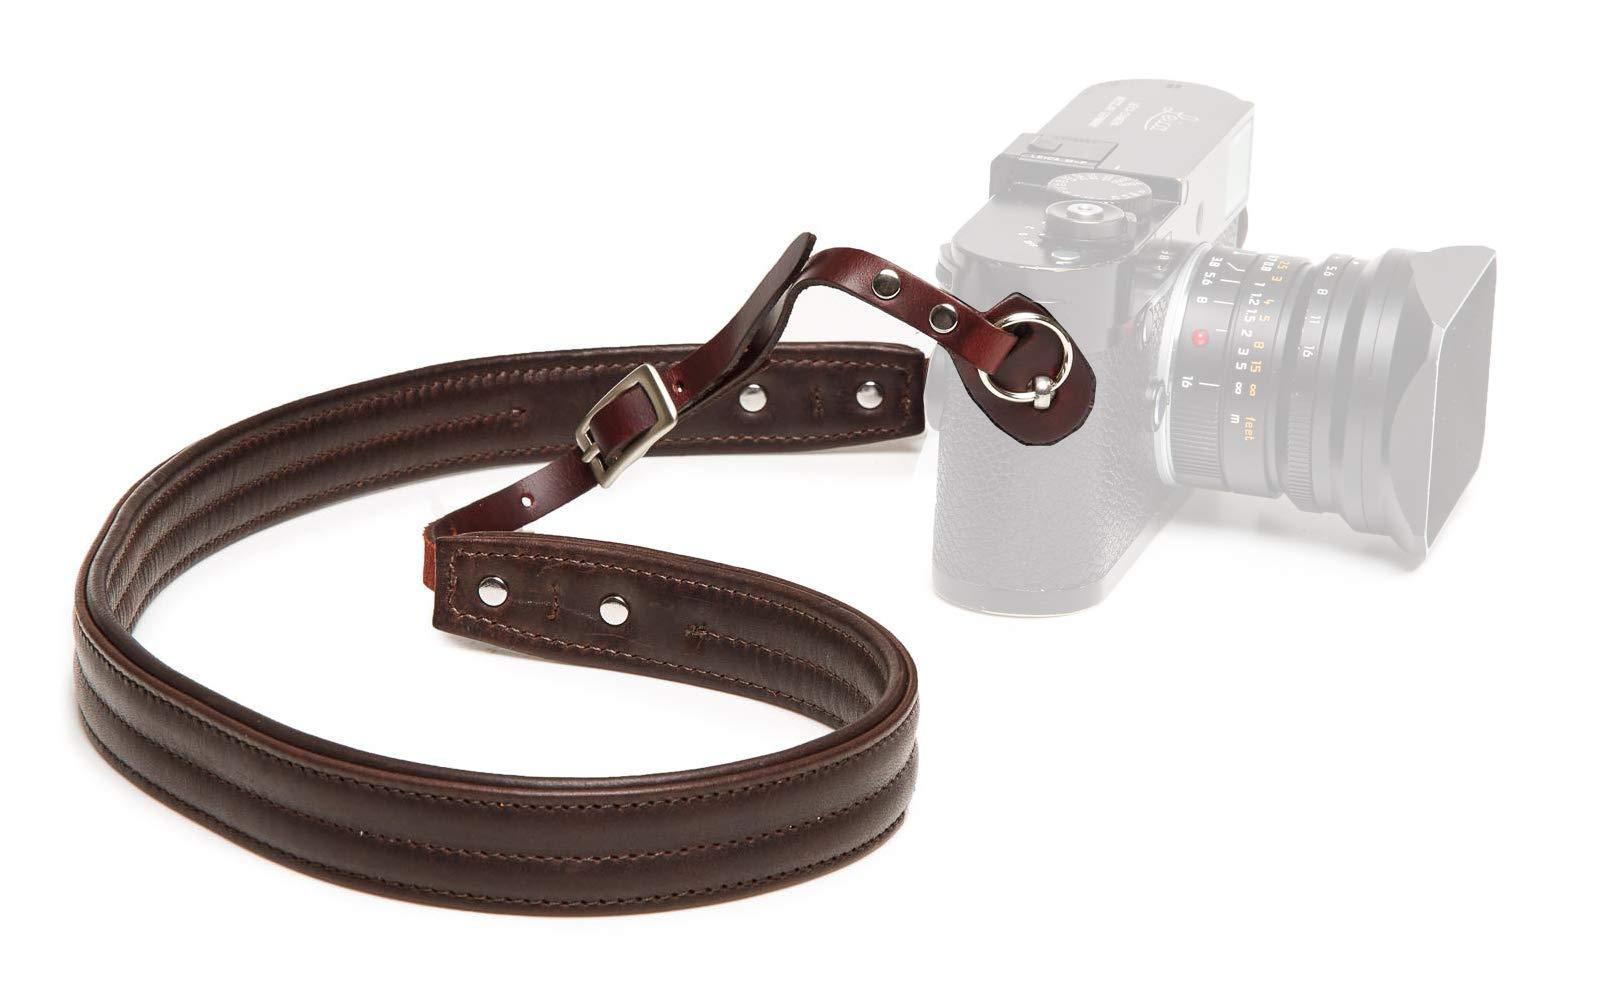 ONA - The Oslo Leather Camera Strap - Dark Truffle Leather by Ona